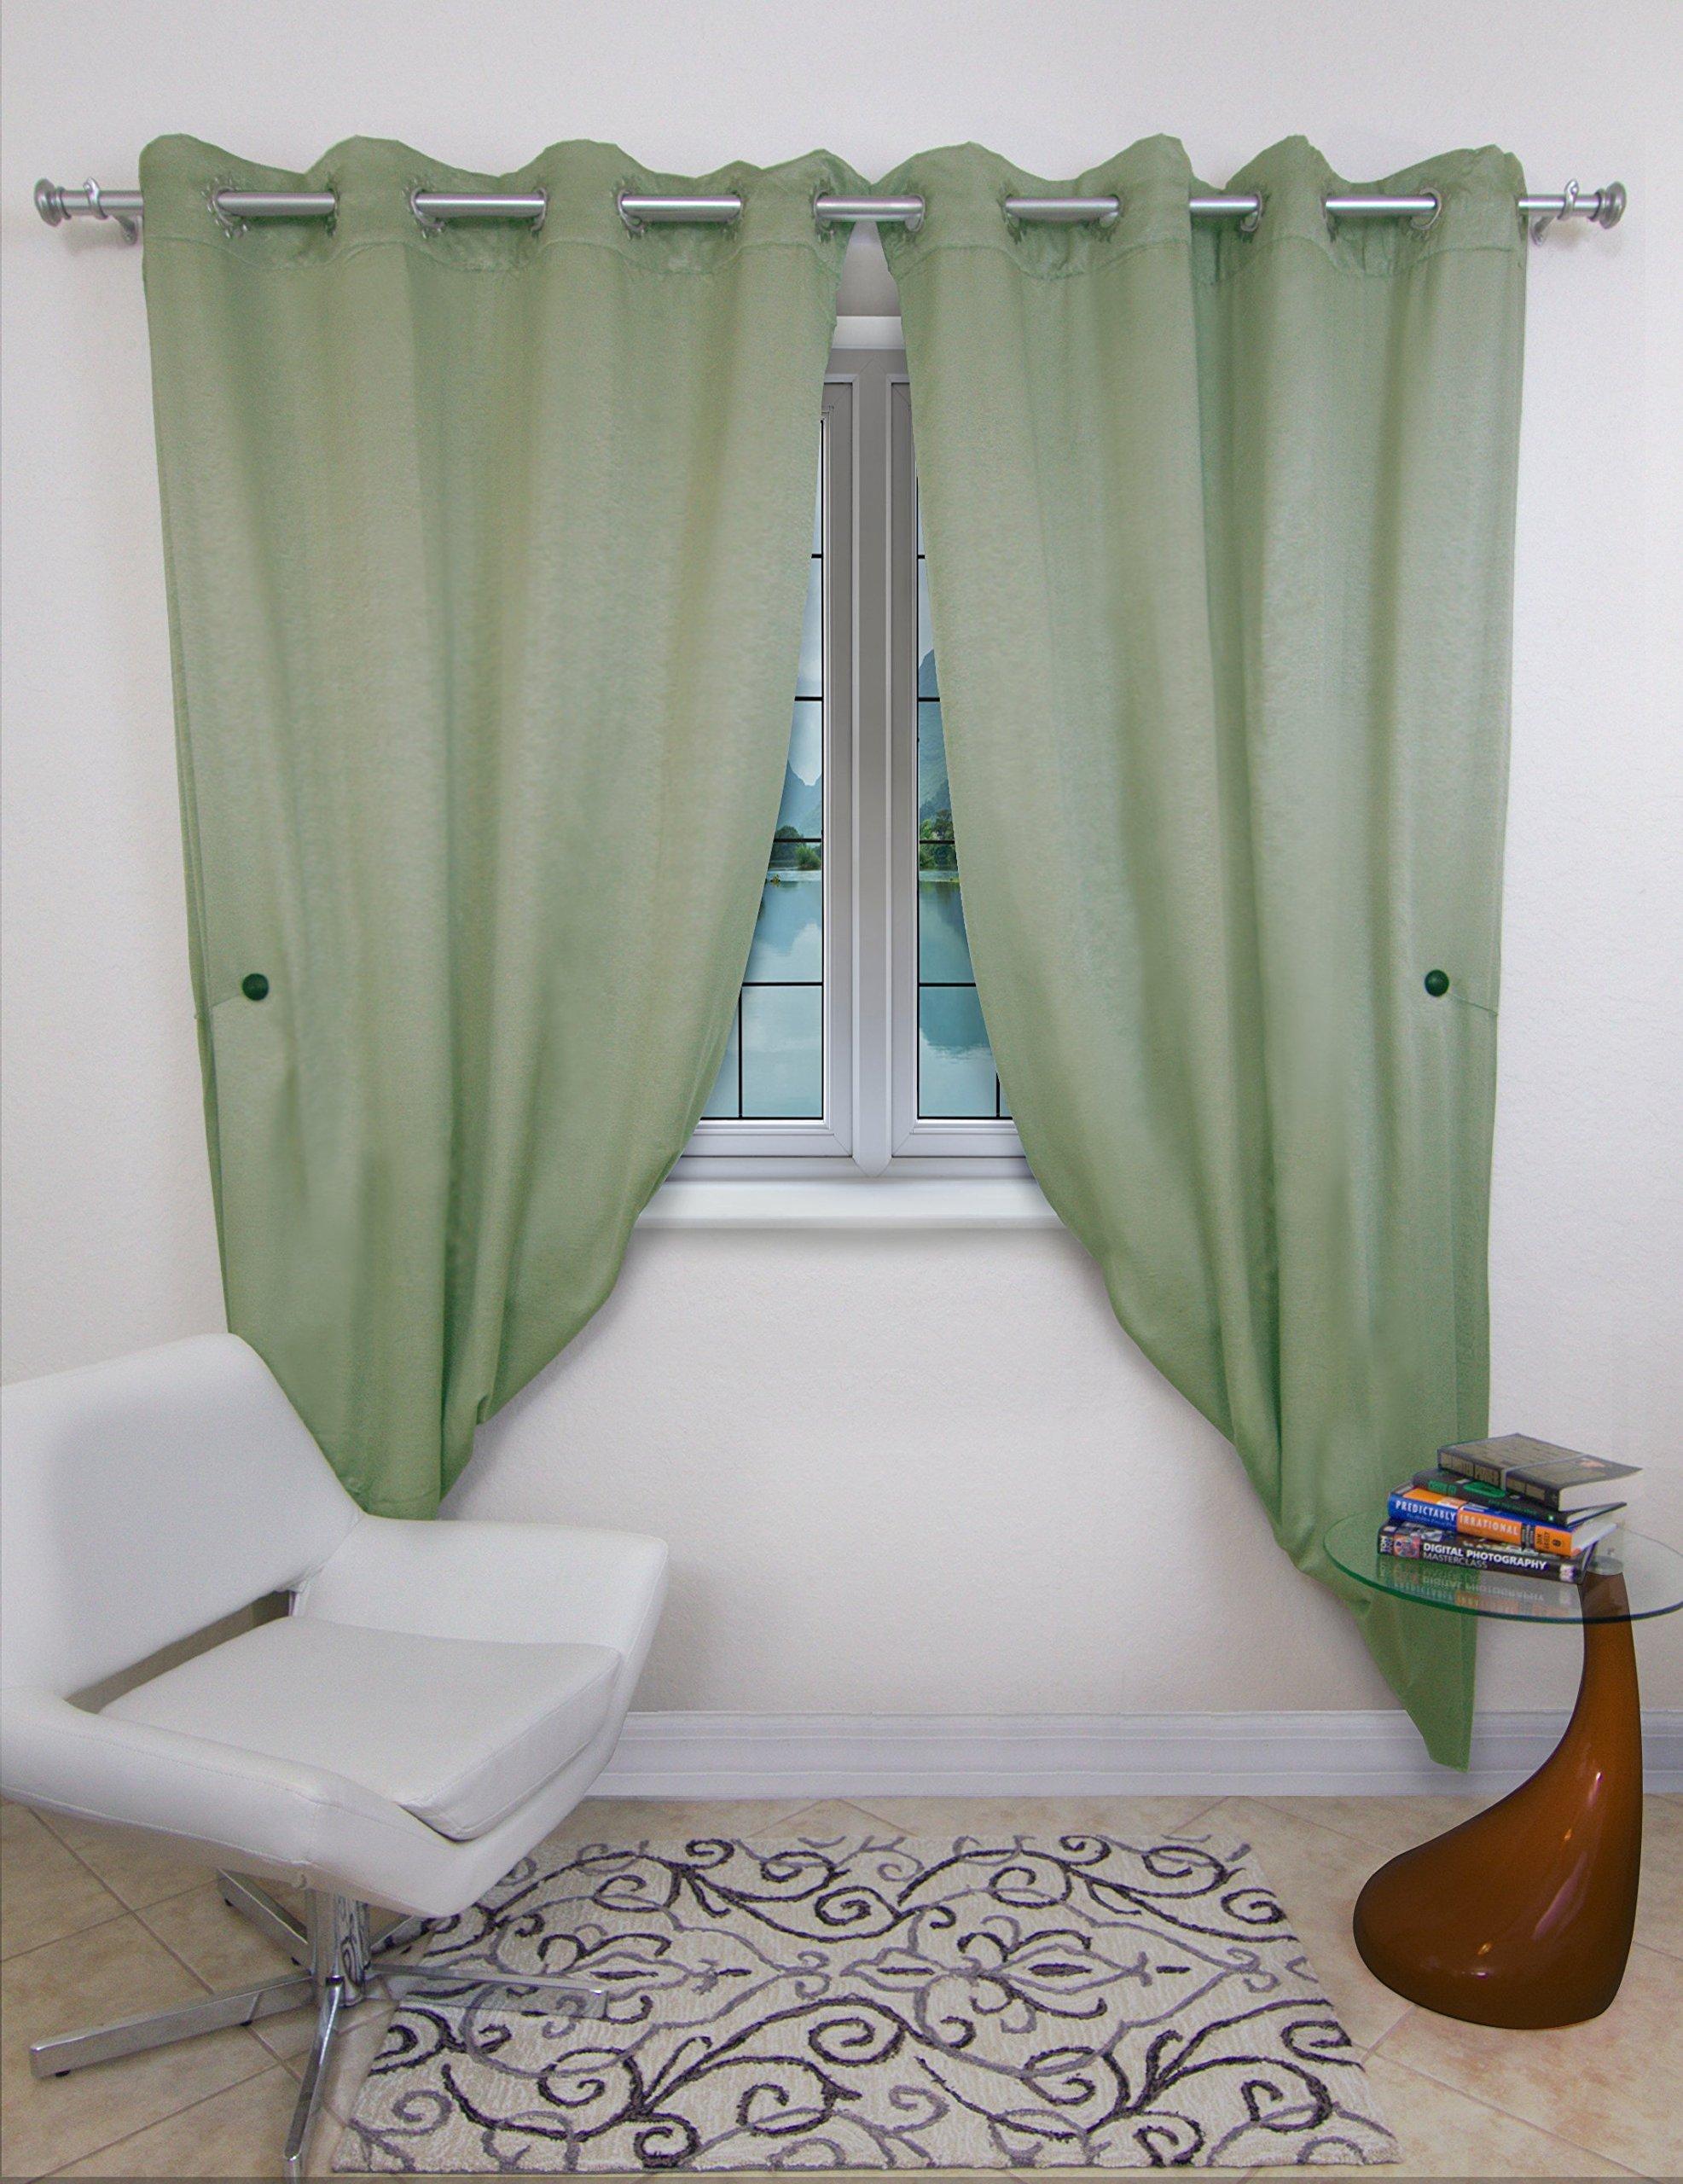 MagnaClips Set of 2 Magnetic Curtain Tiebacks or Holdbacks Wood Buckle Curtain Clips, Vela (White)